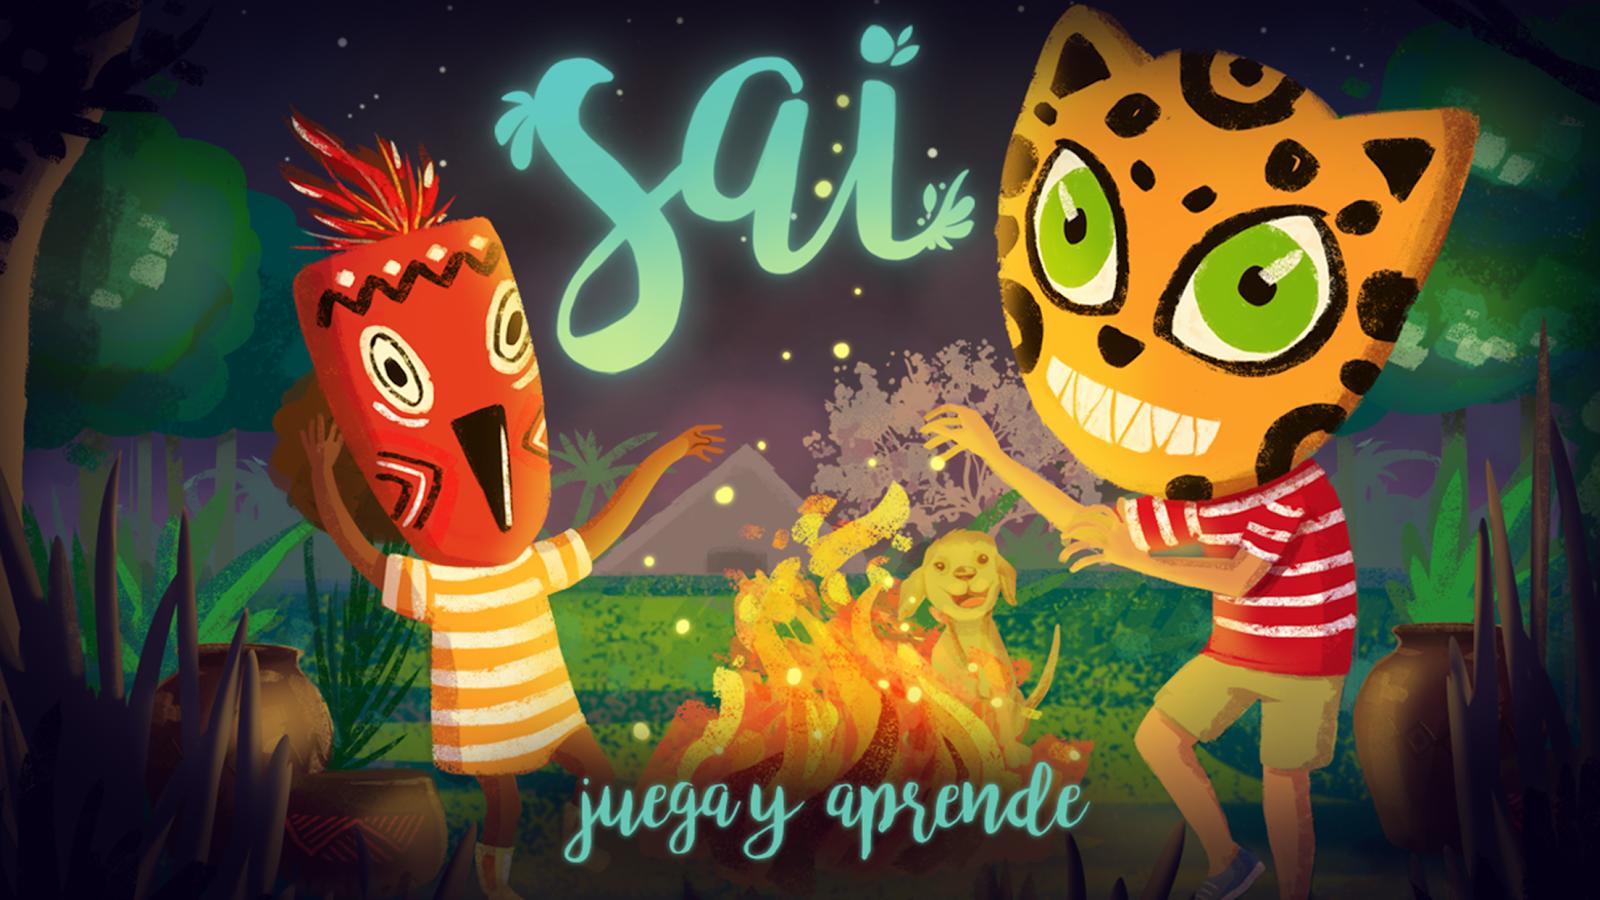 SAI Juega y Aprende | Role: Unity 3D Programmer